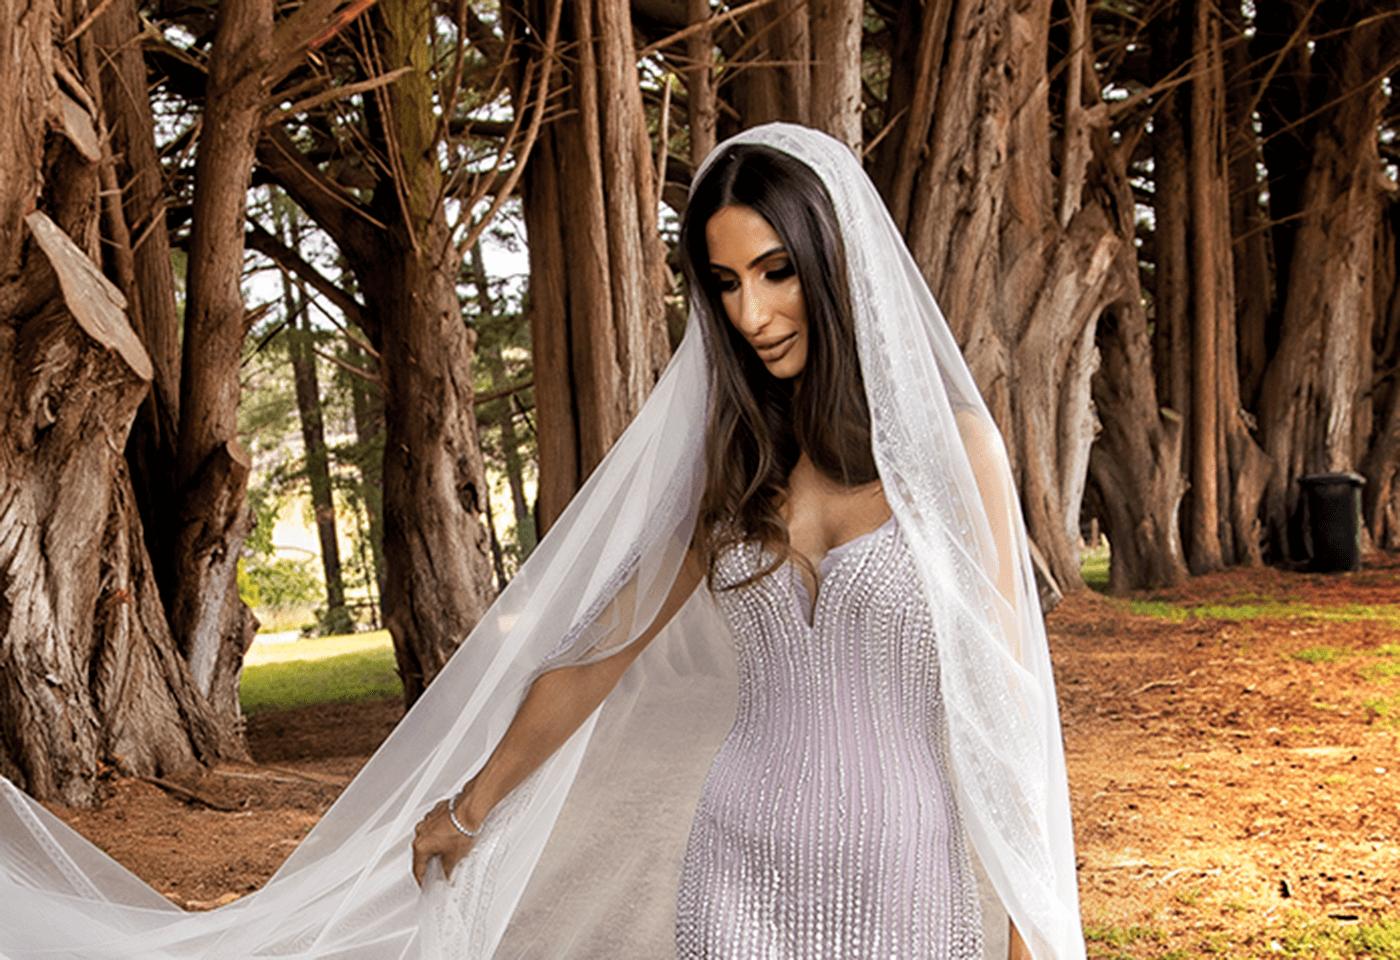 Image of bride by Yervant Zanazanian